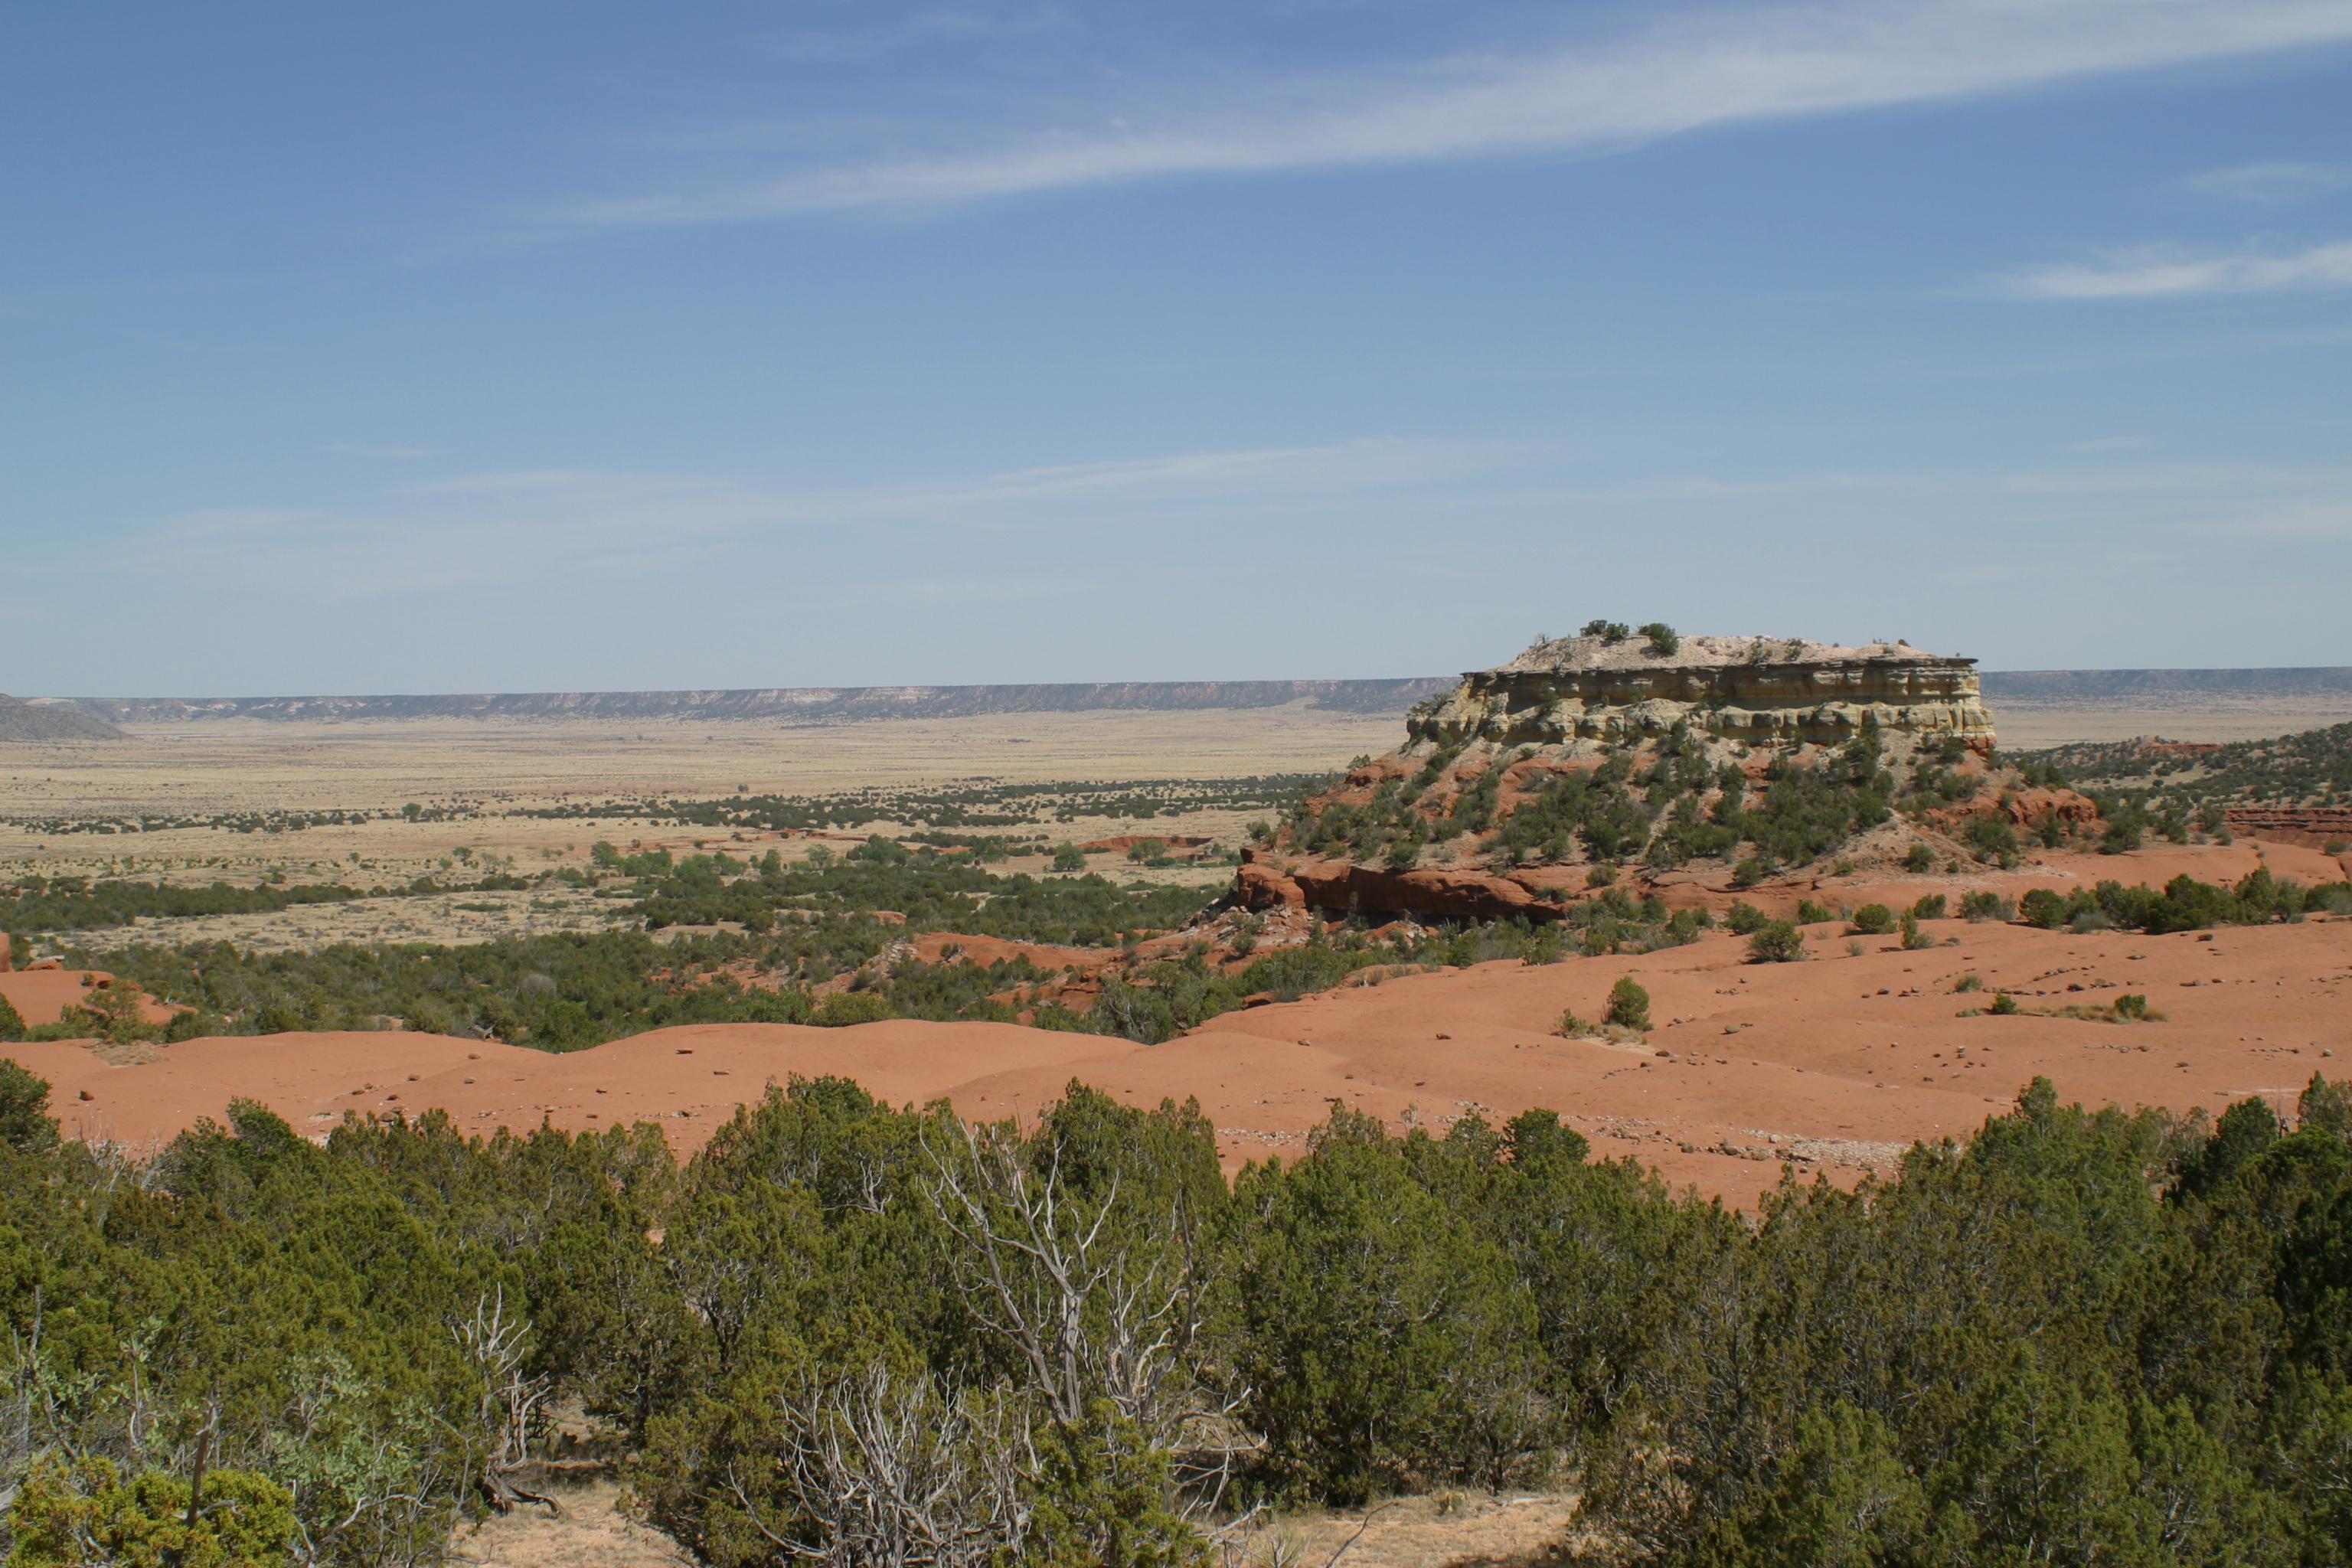 File:Alamogordo Valley Eastern New Mexico 2009.jpg - Wikimedia Commons